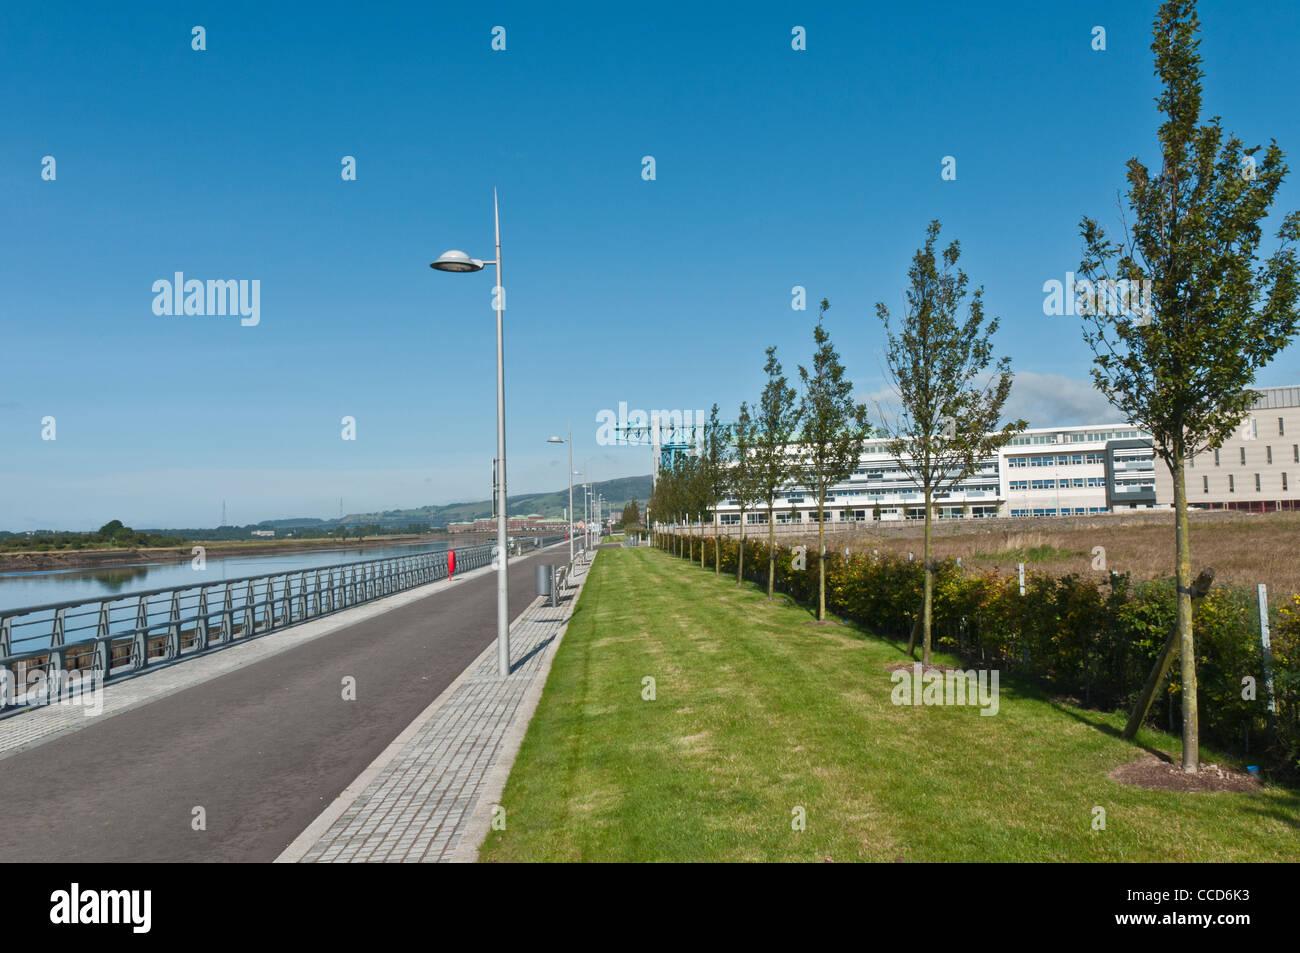 Walkway beside the River Clyde Clydebank West Dunbartonshire Scotland - Stock Image